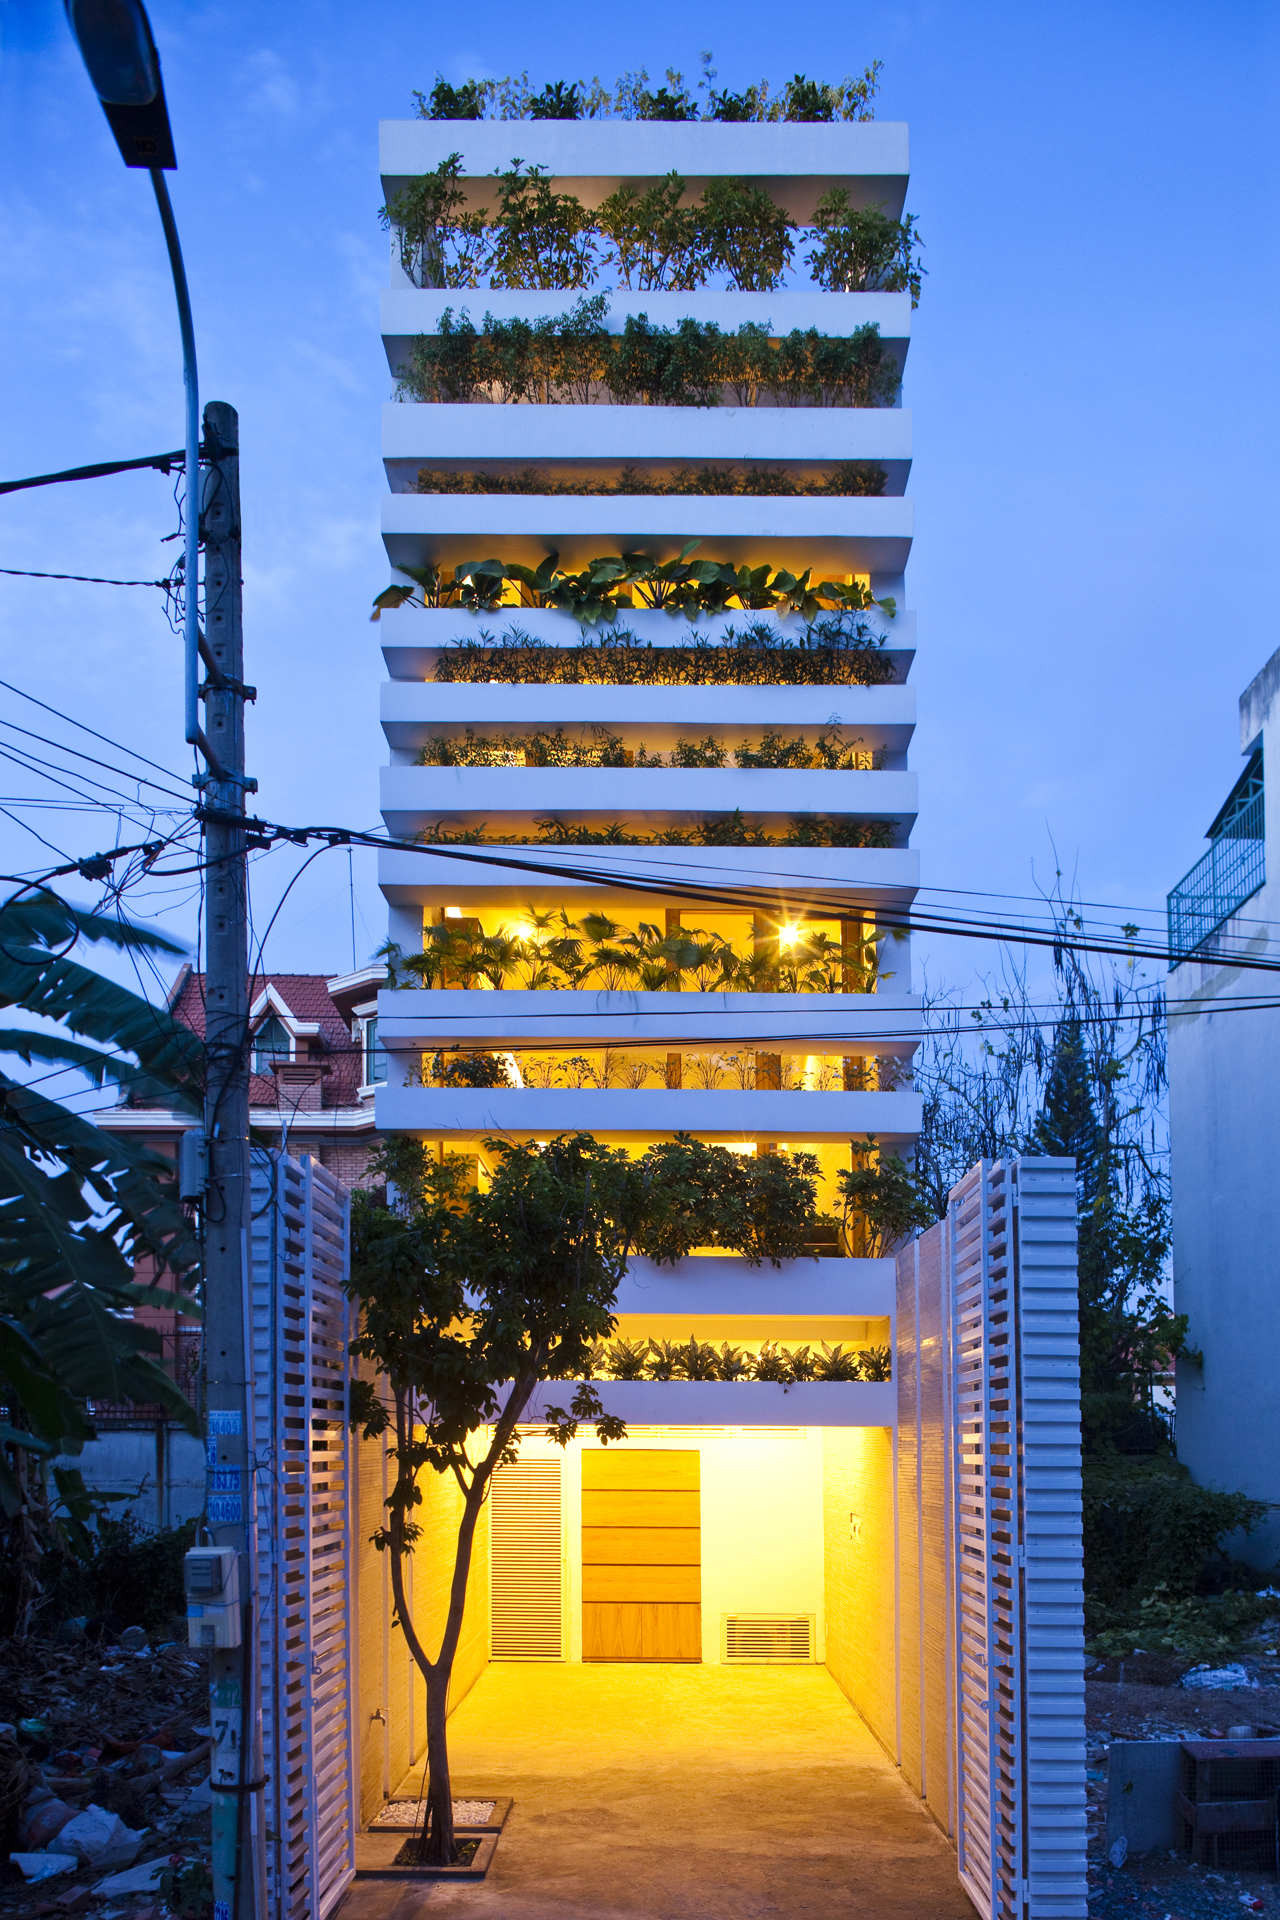 Gallery Of Stacking Green VTN Architects 12 Magnificent Stacking Green Vo Trong Nghia Daisuke Sanuki Shunri Nishizawa